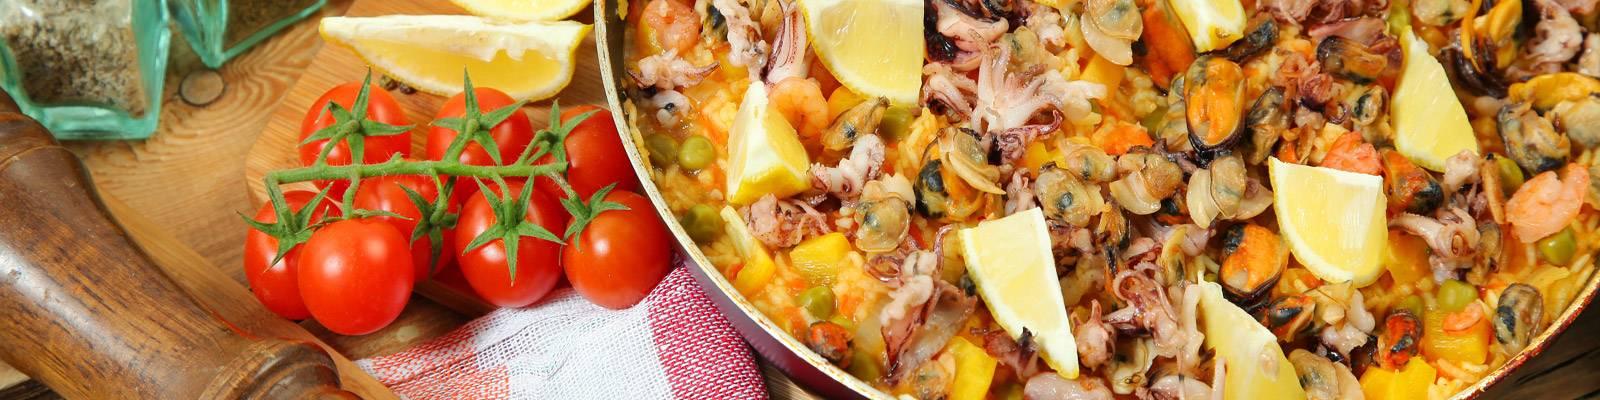 Gastronomia Ibiza: il Bullit de Peix